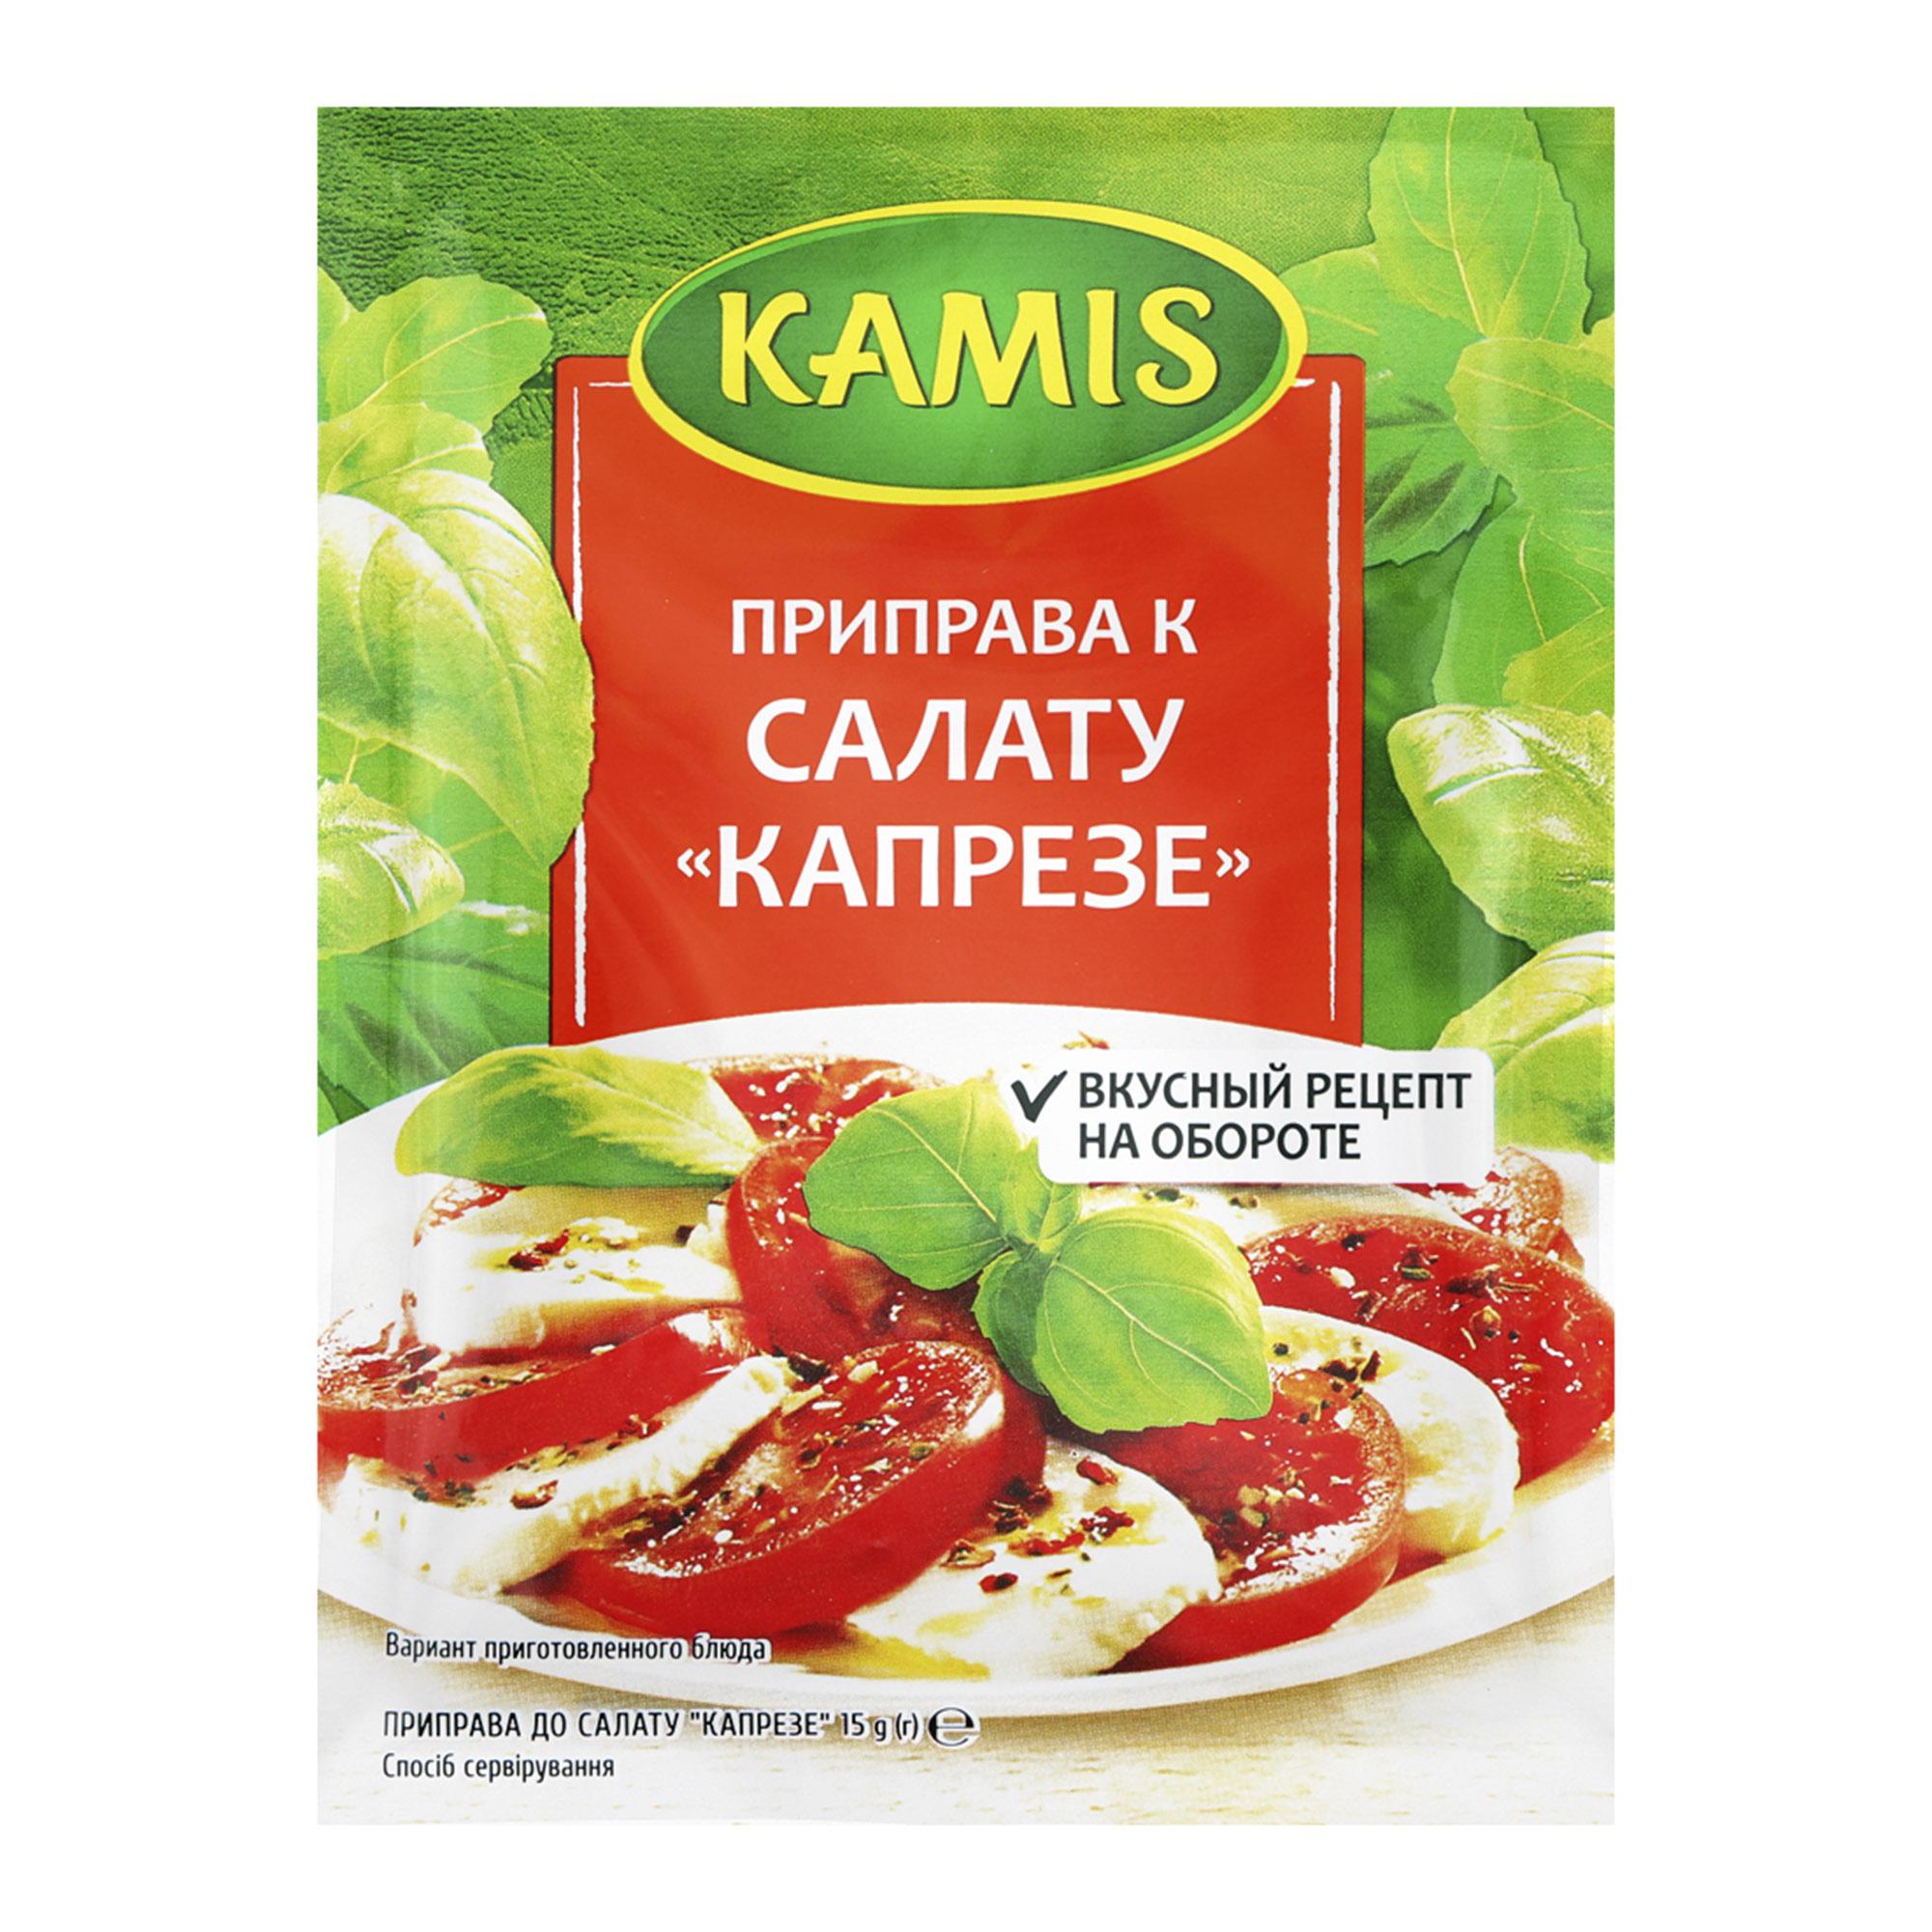 Фото - Приправа Kamis к салату Капрезе 15 г kamis приправа тосканский лосось 4х18 г